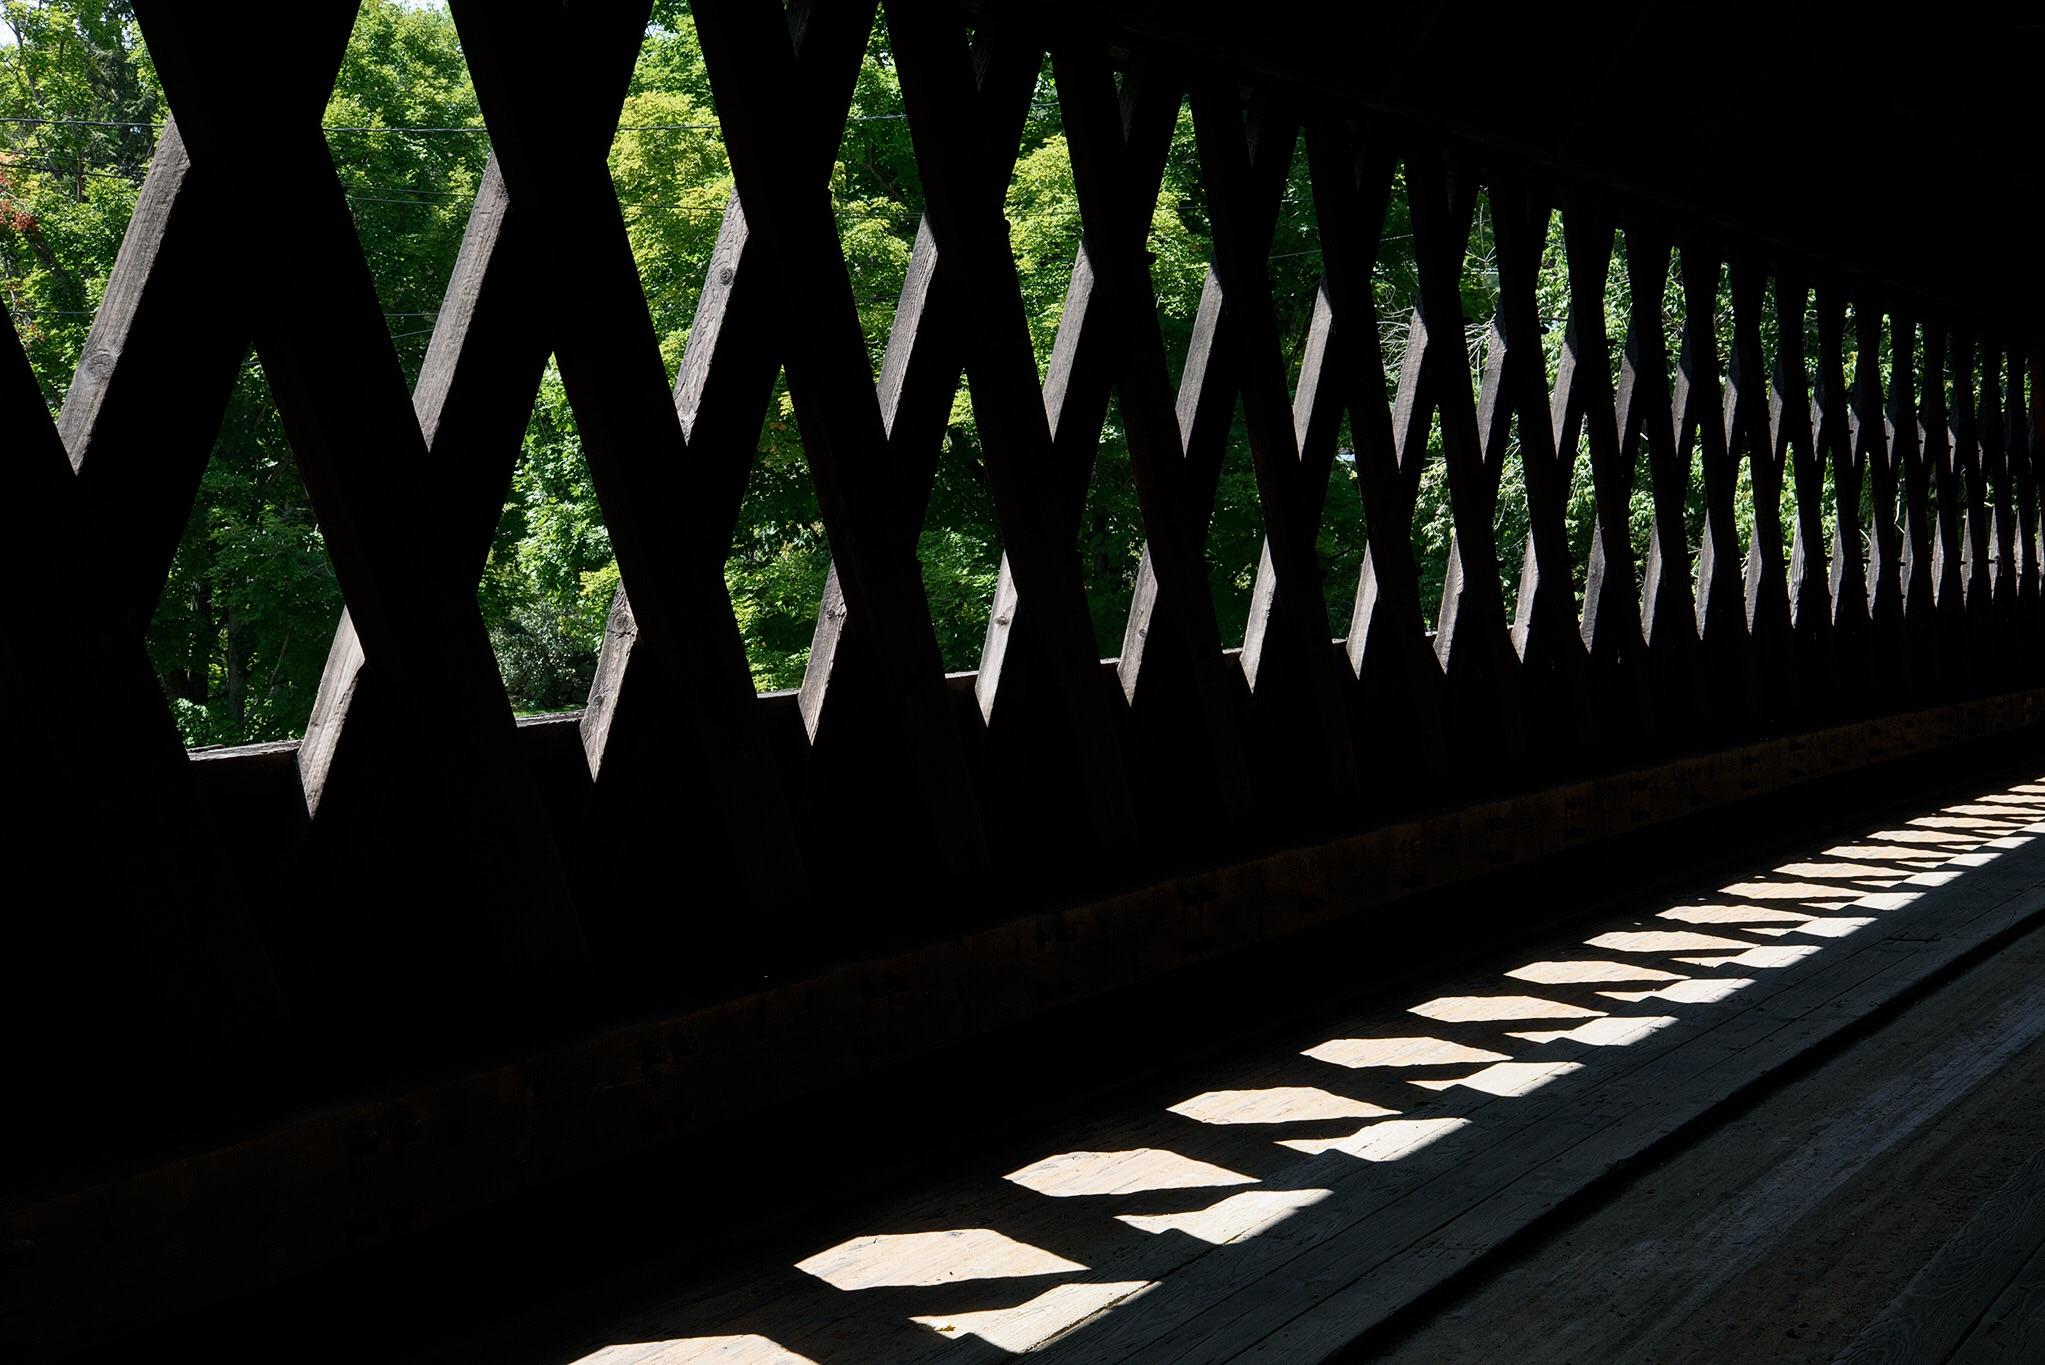 The Middle Bridge